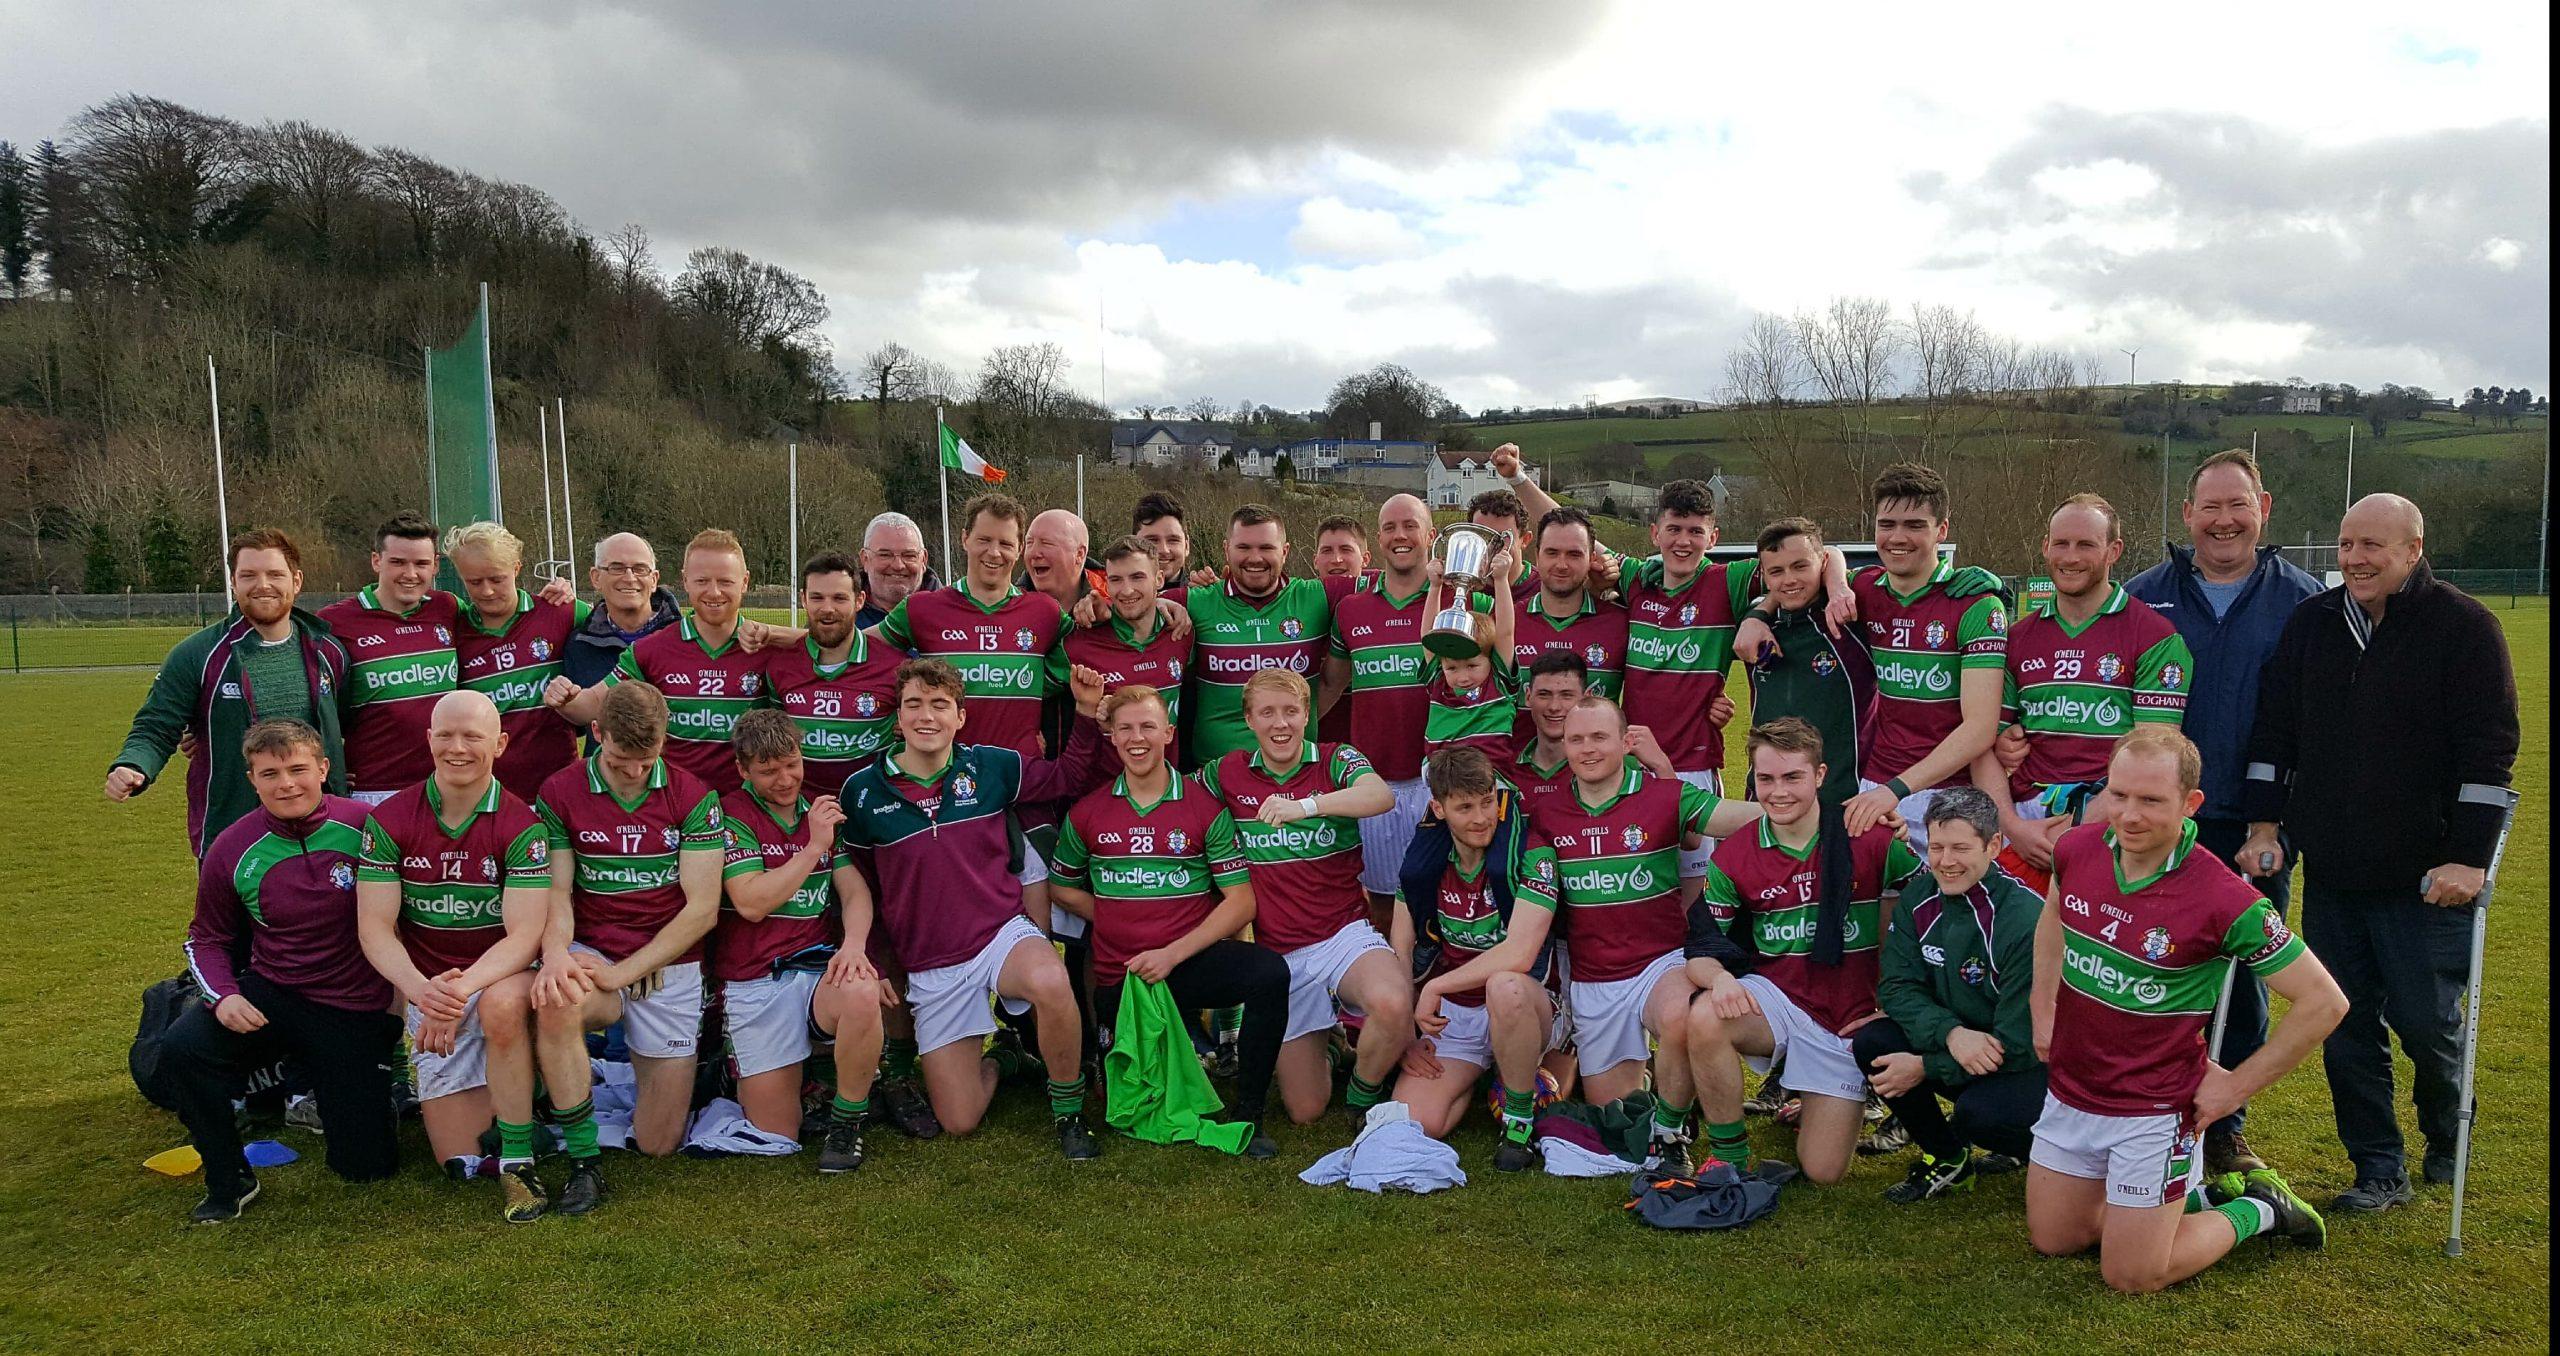 Ulster Football Club Leagues Winners 2018